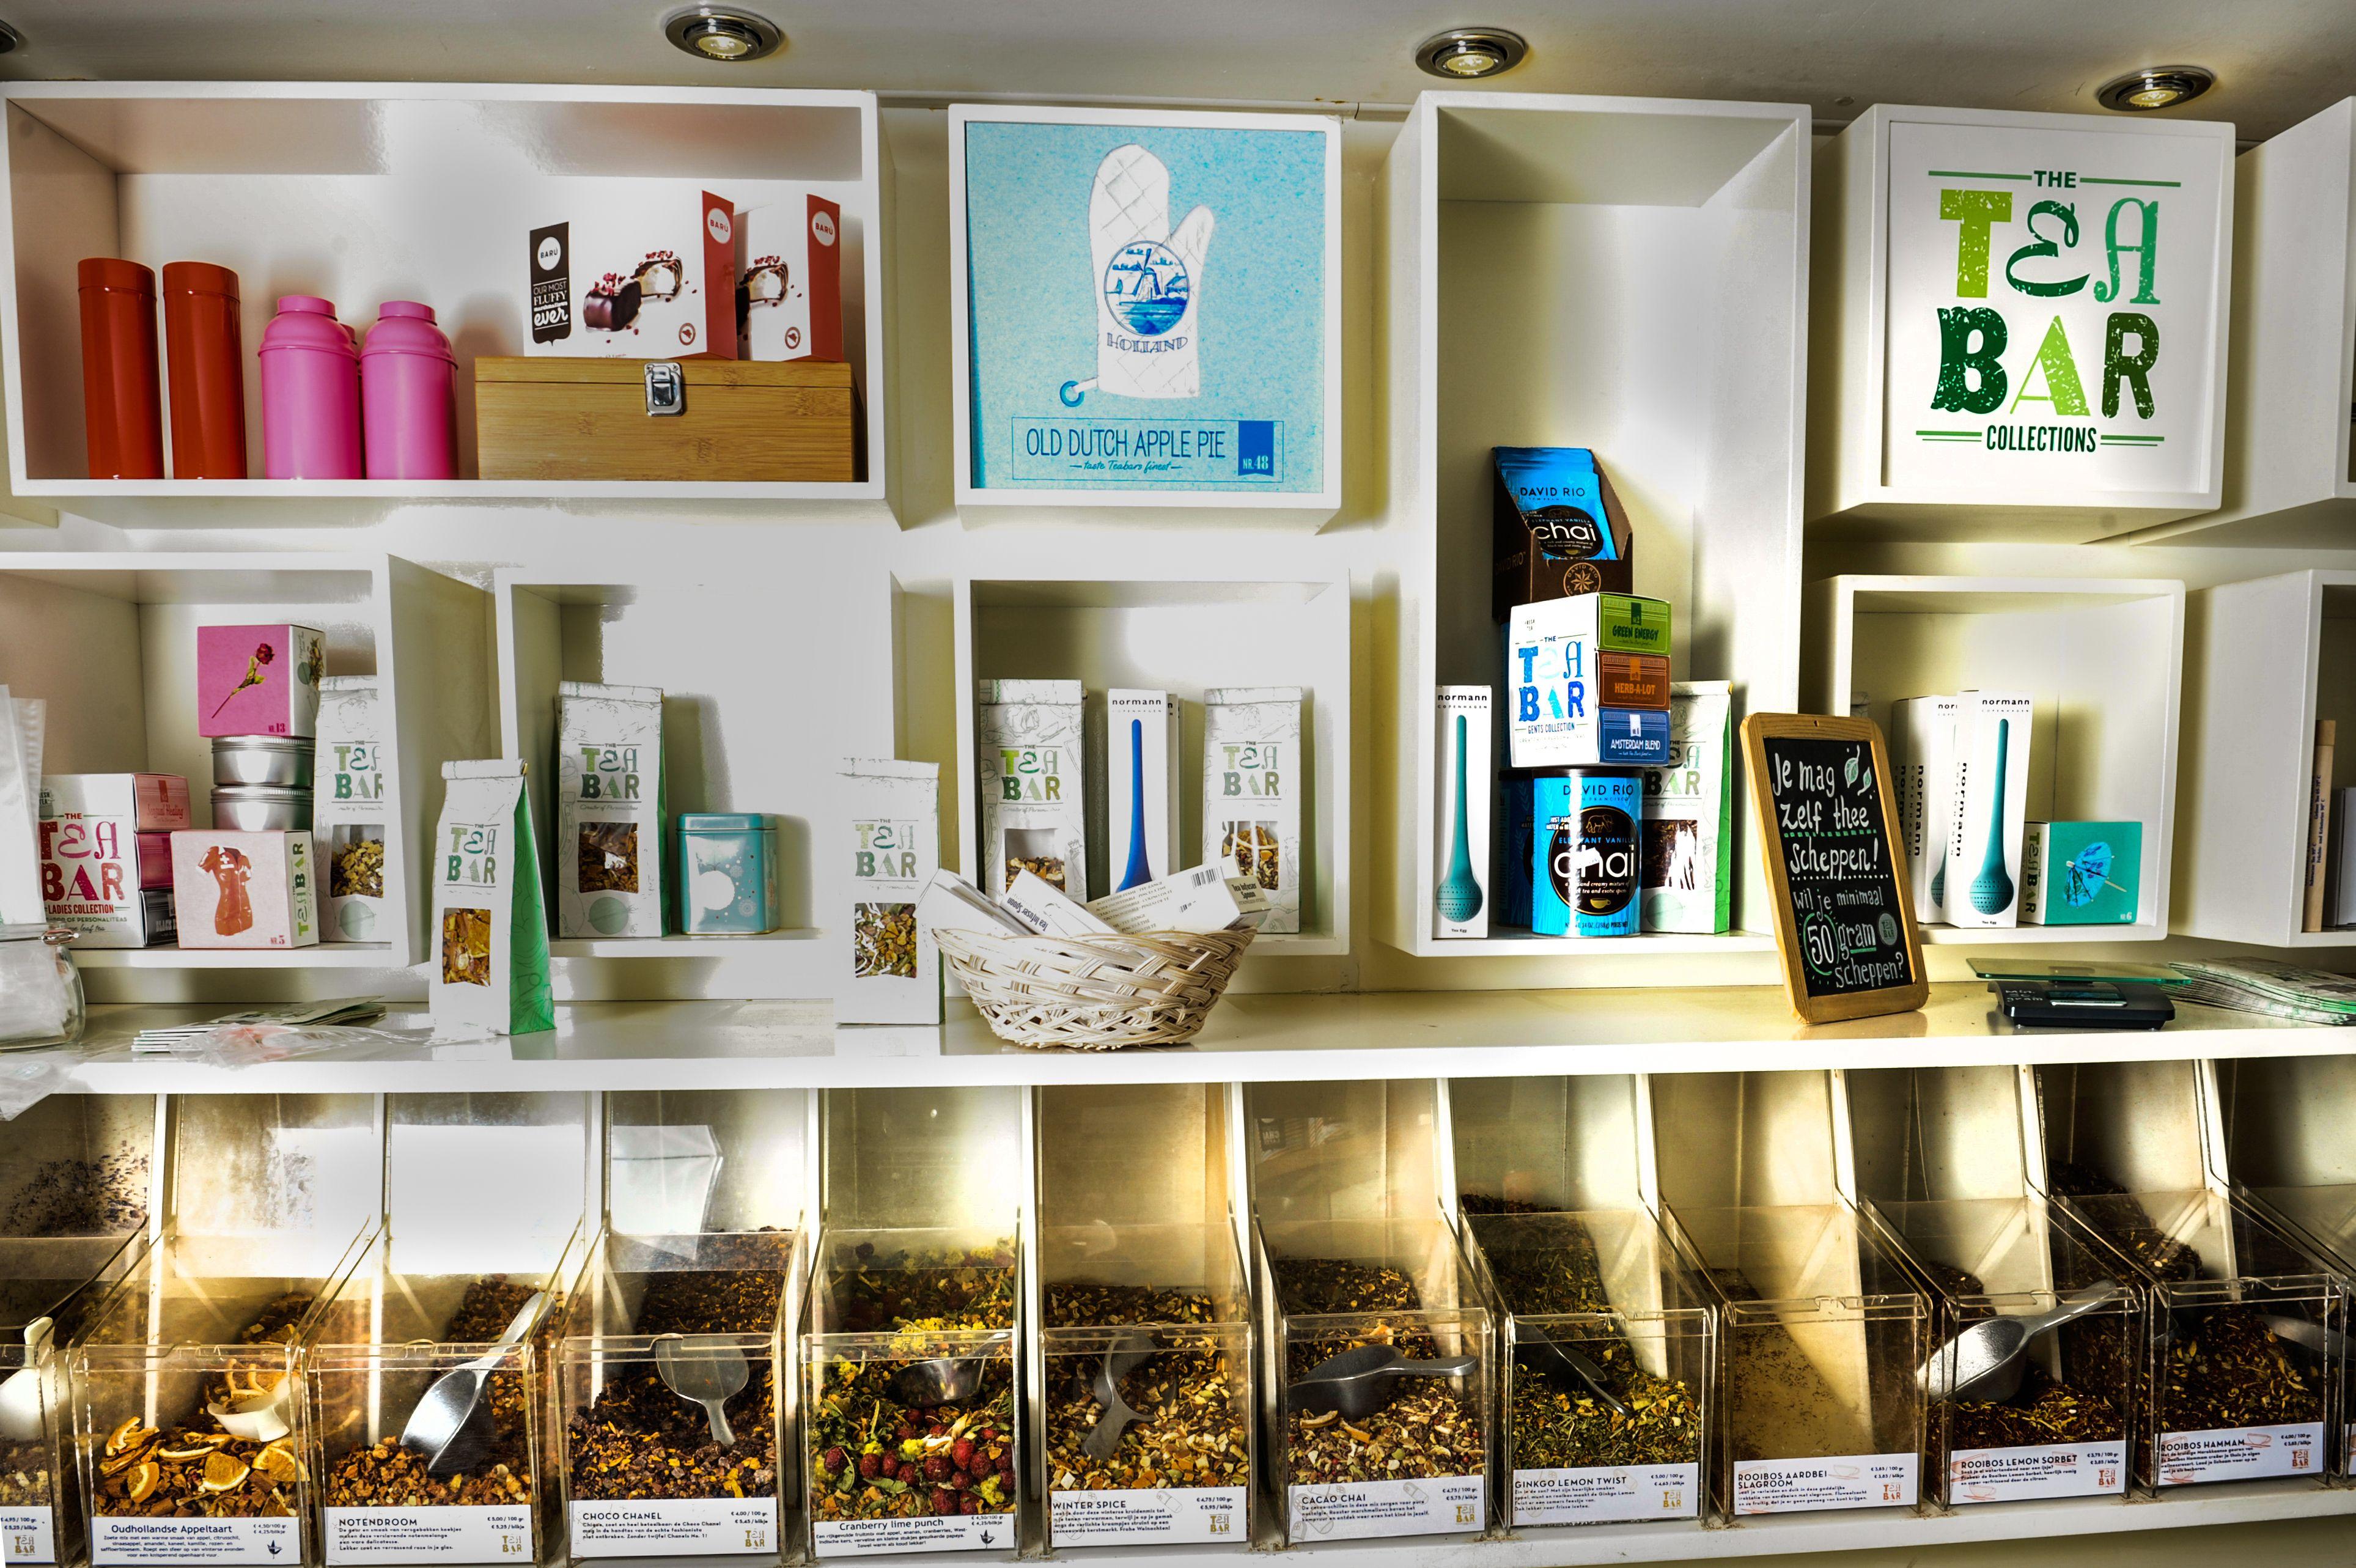 Tea Bar self service tea shop (Amsterdam) www.teabar.nl